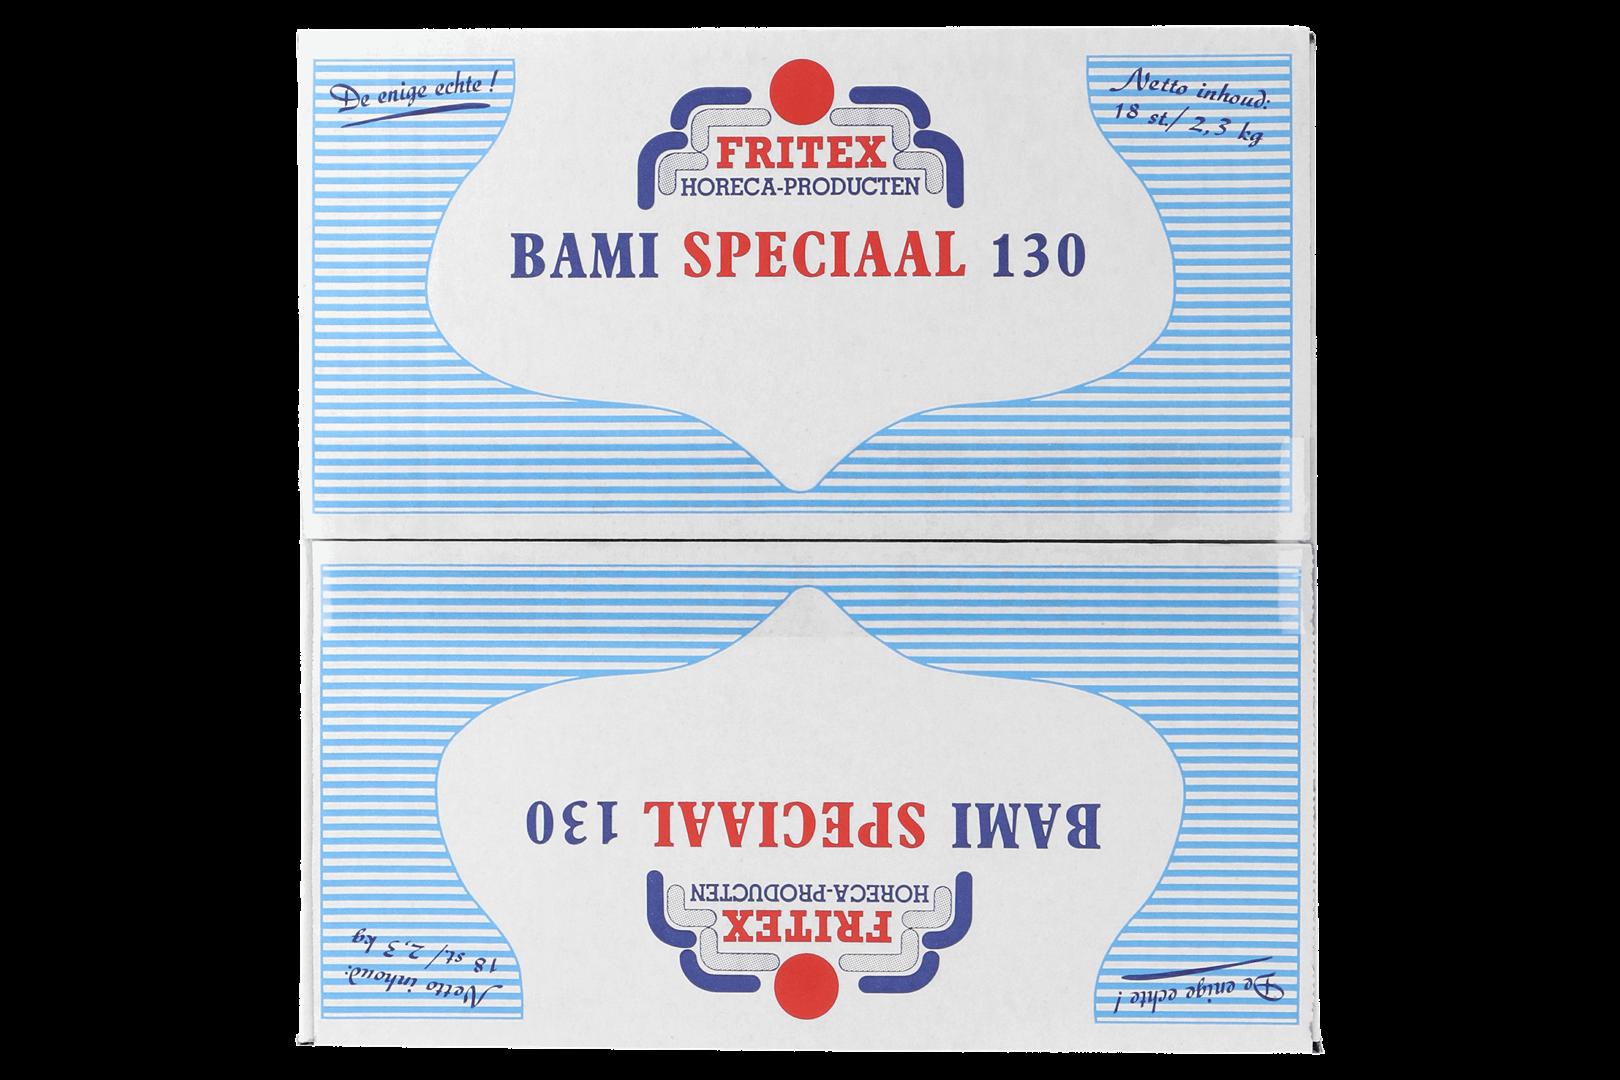 Productafbeelding Bamischijf Speciaal Fritex 18x130 gr